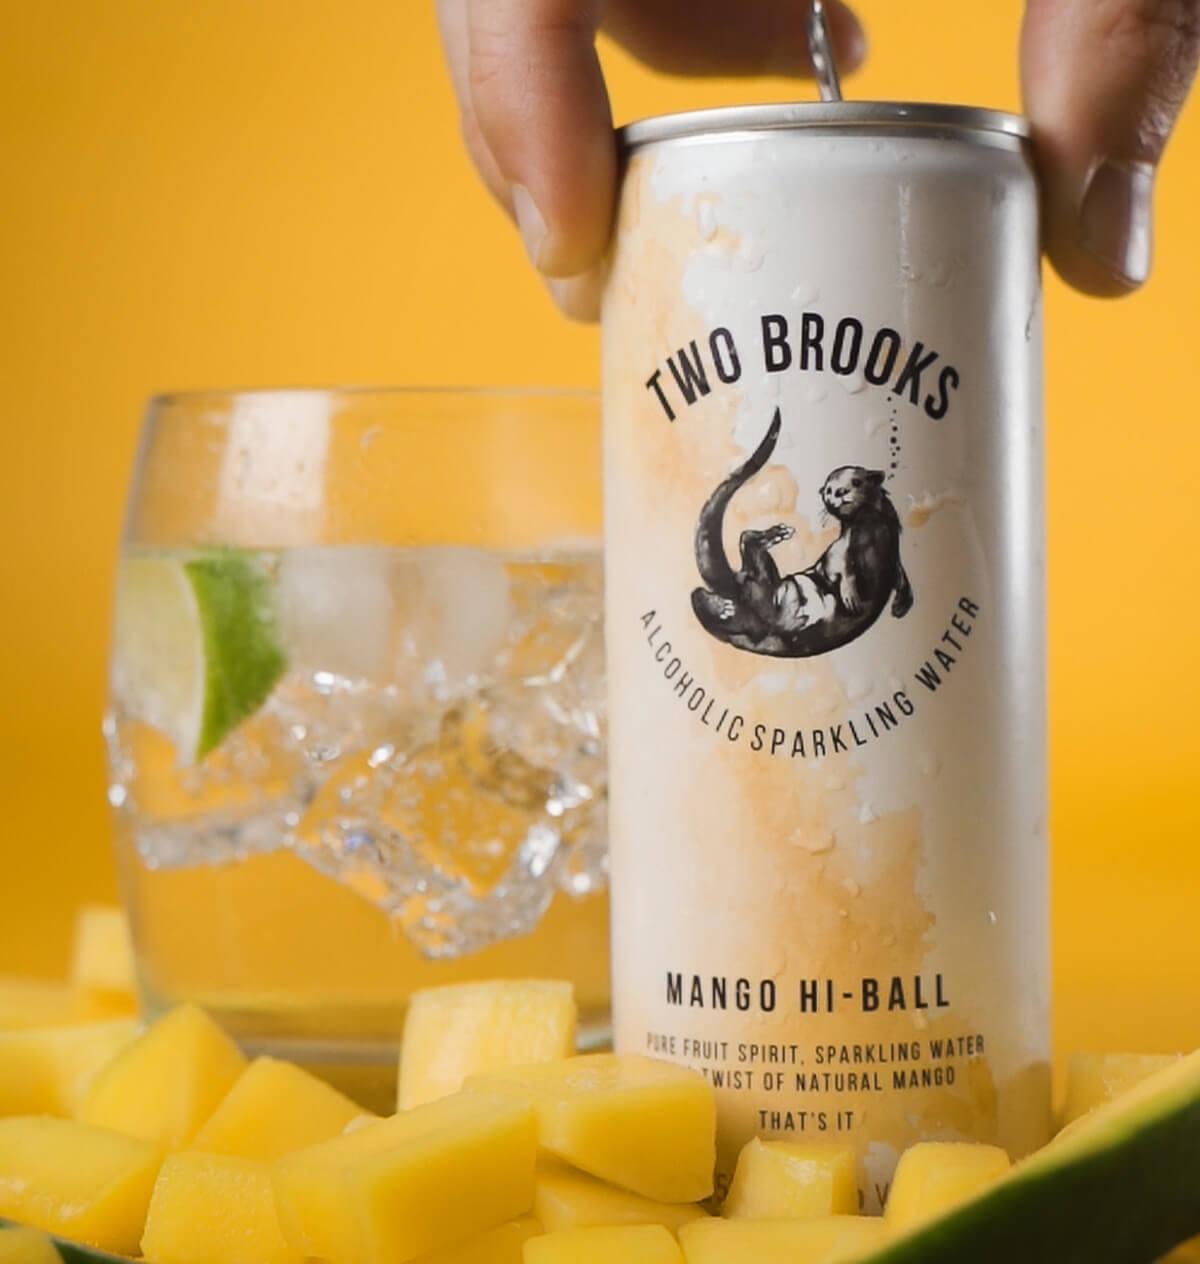 Mango Hi-Ball Two Brooks